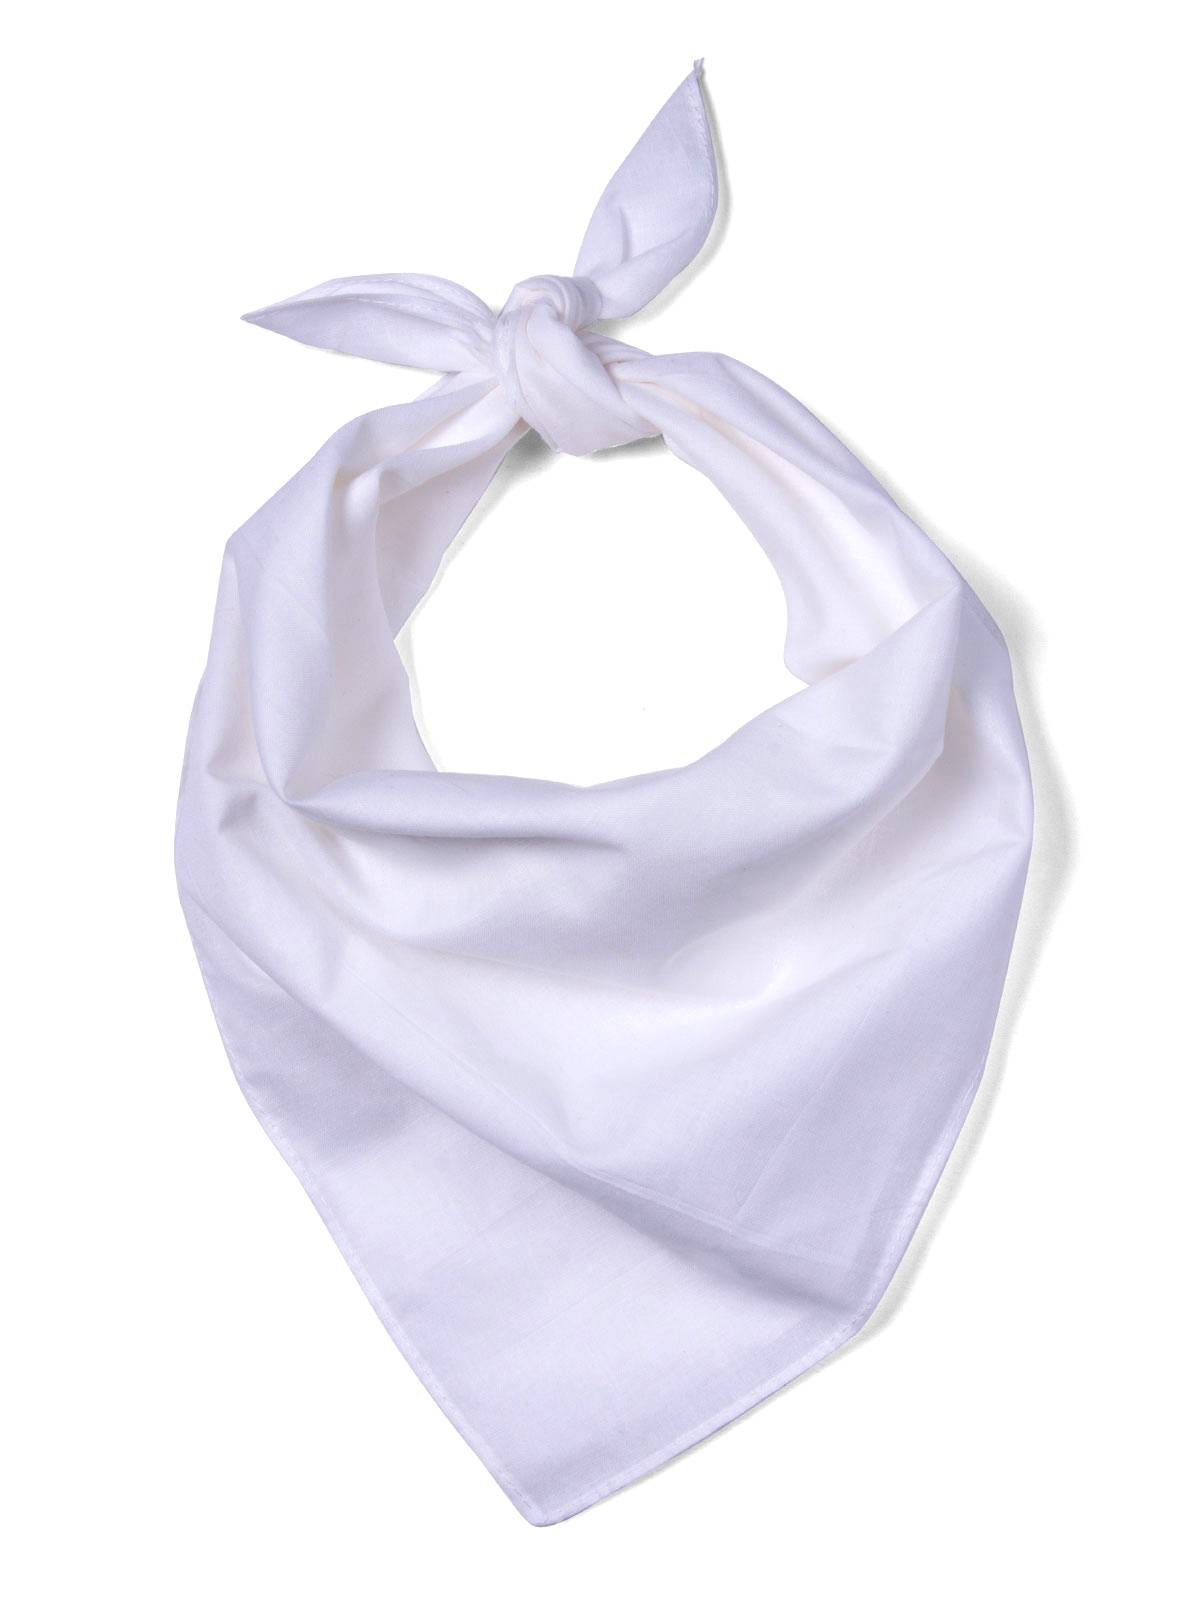 Customized White Bandannas